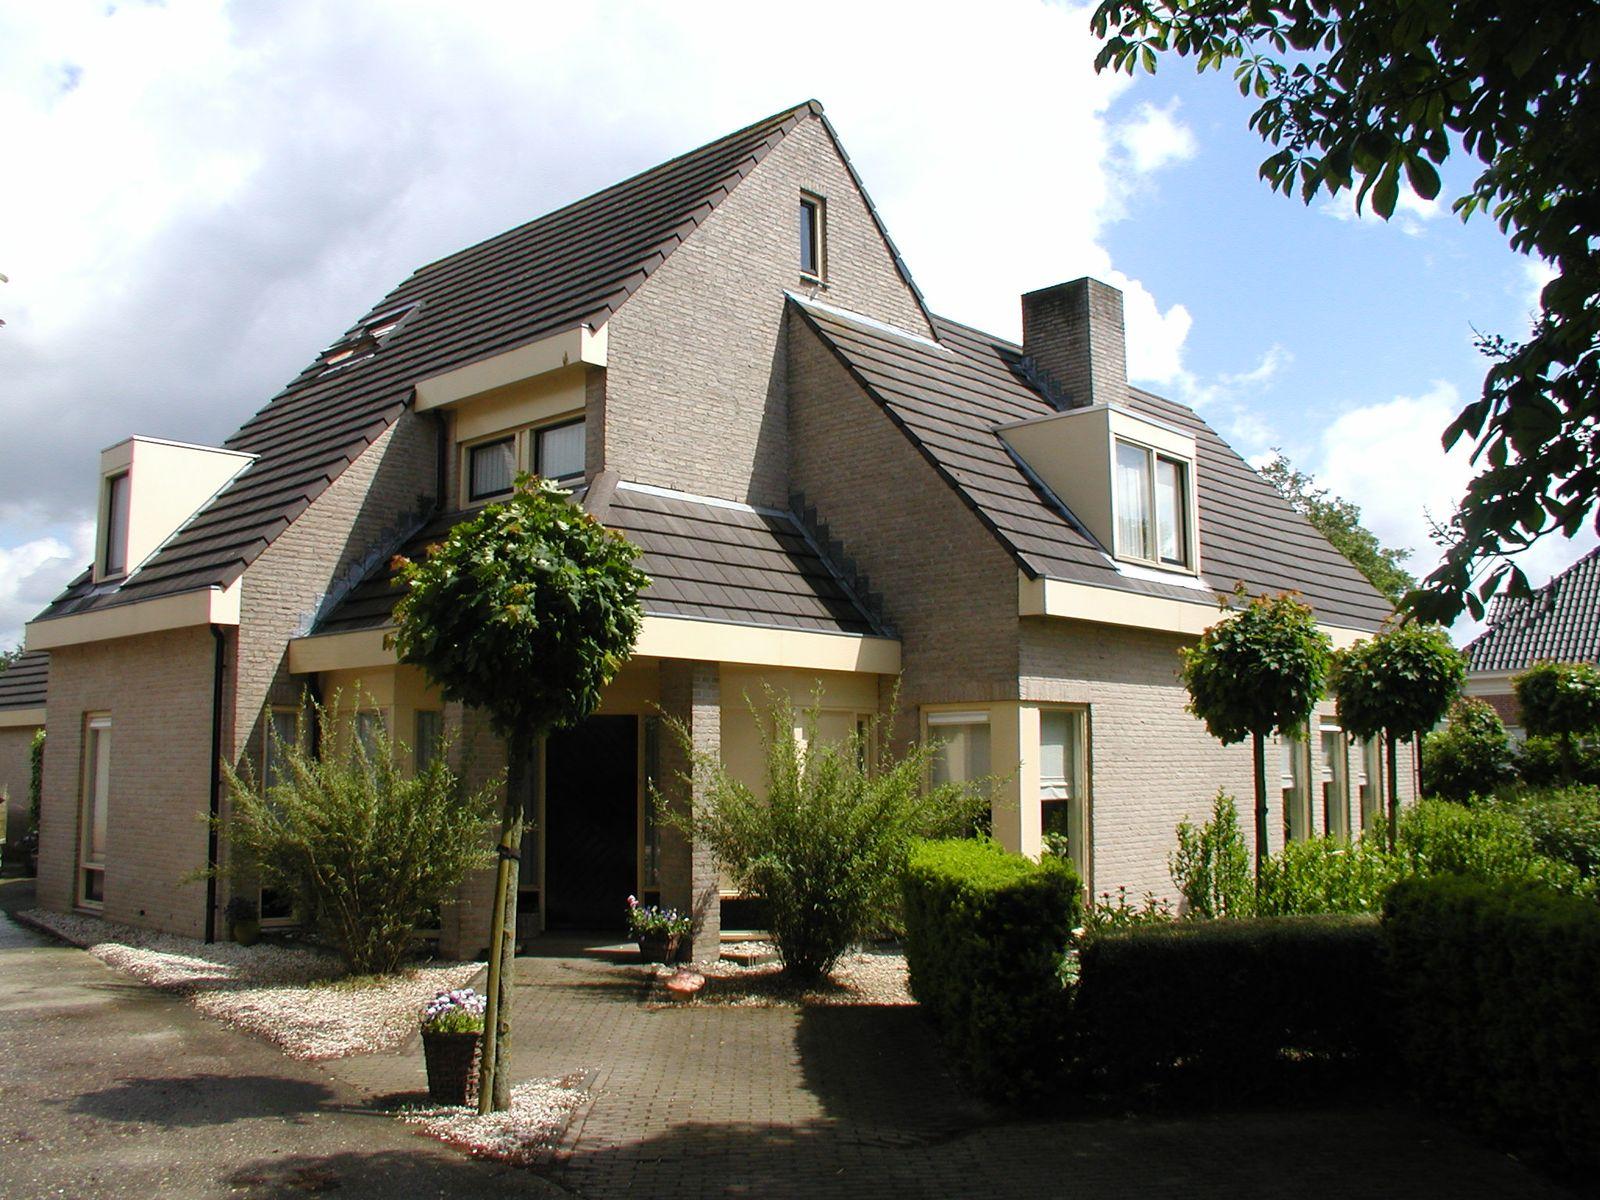 Lange Weistraat 4, Kerkdriel